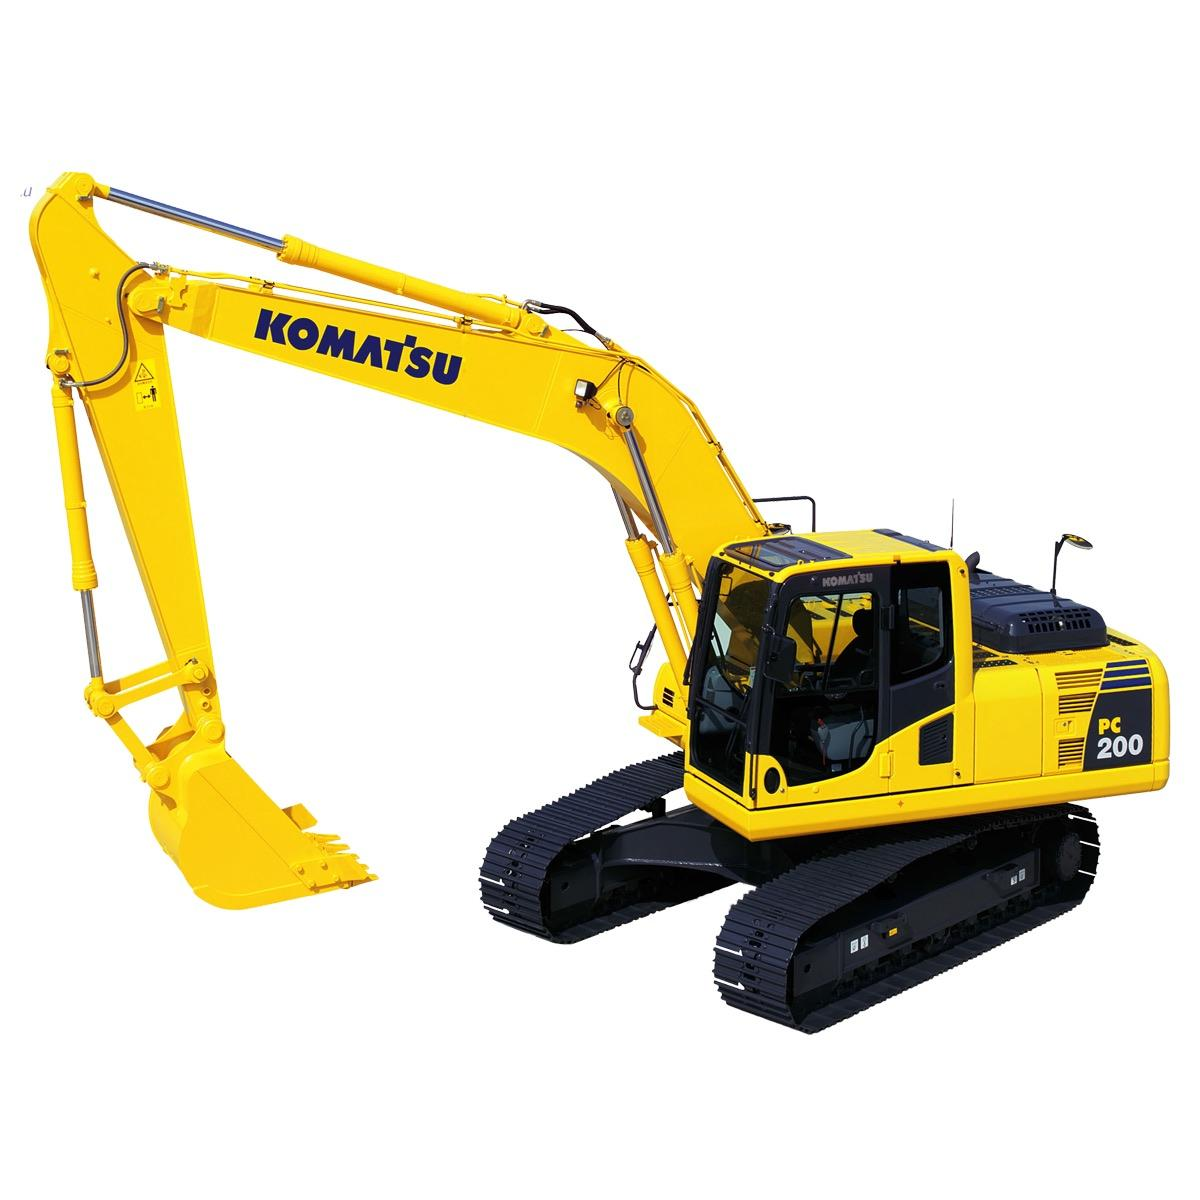 Komatsu Hydraulic Excavator Pc200 Factory Service  U0026 Shop